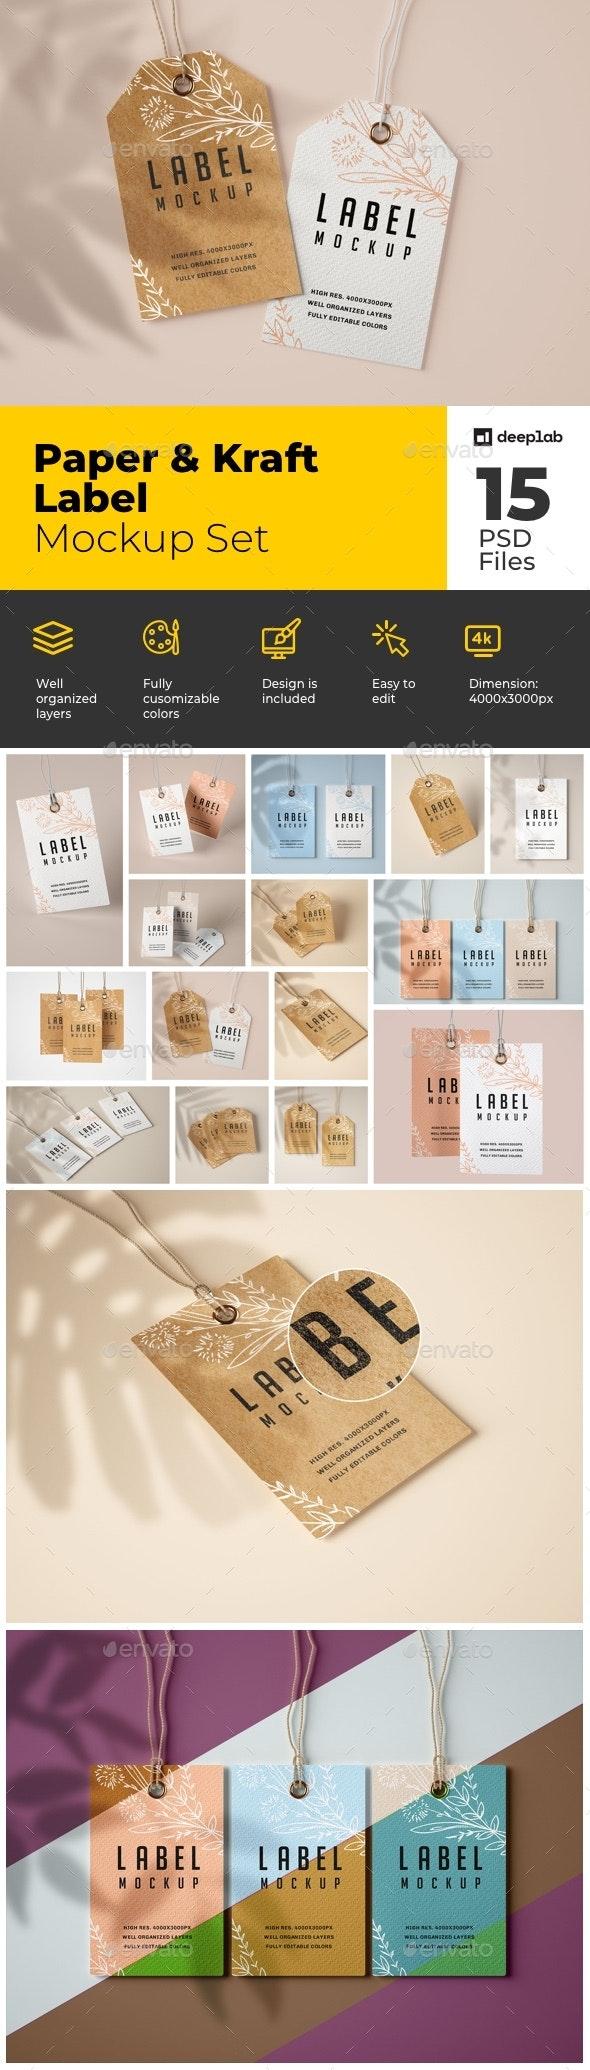 Paper & Kraft Label Mockup Set - Product Mock-Ups Graphics